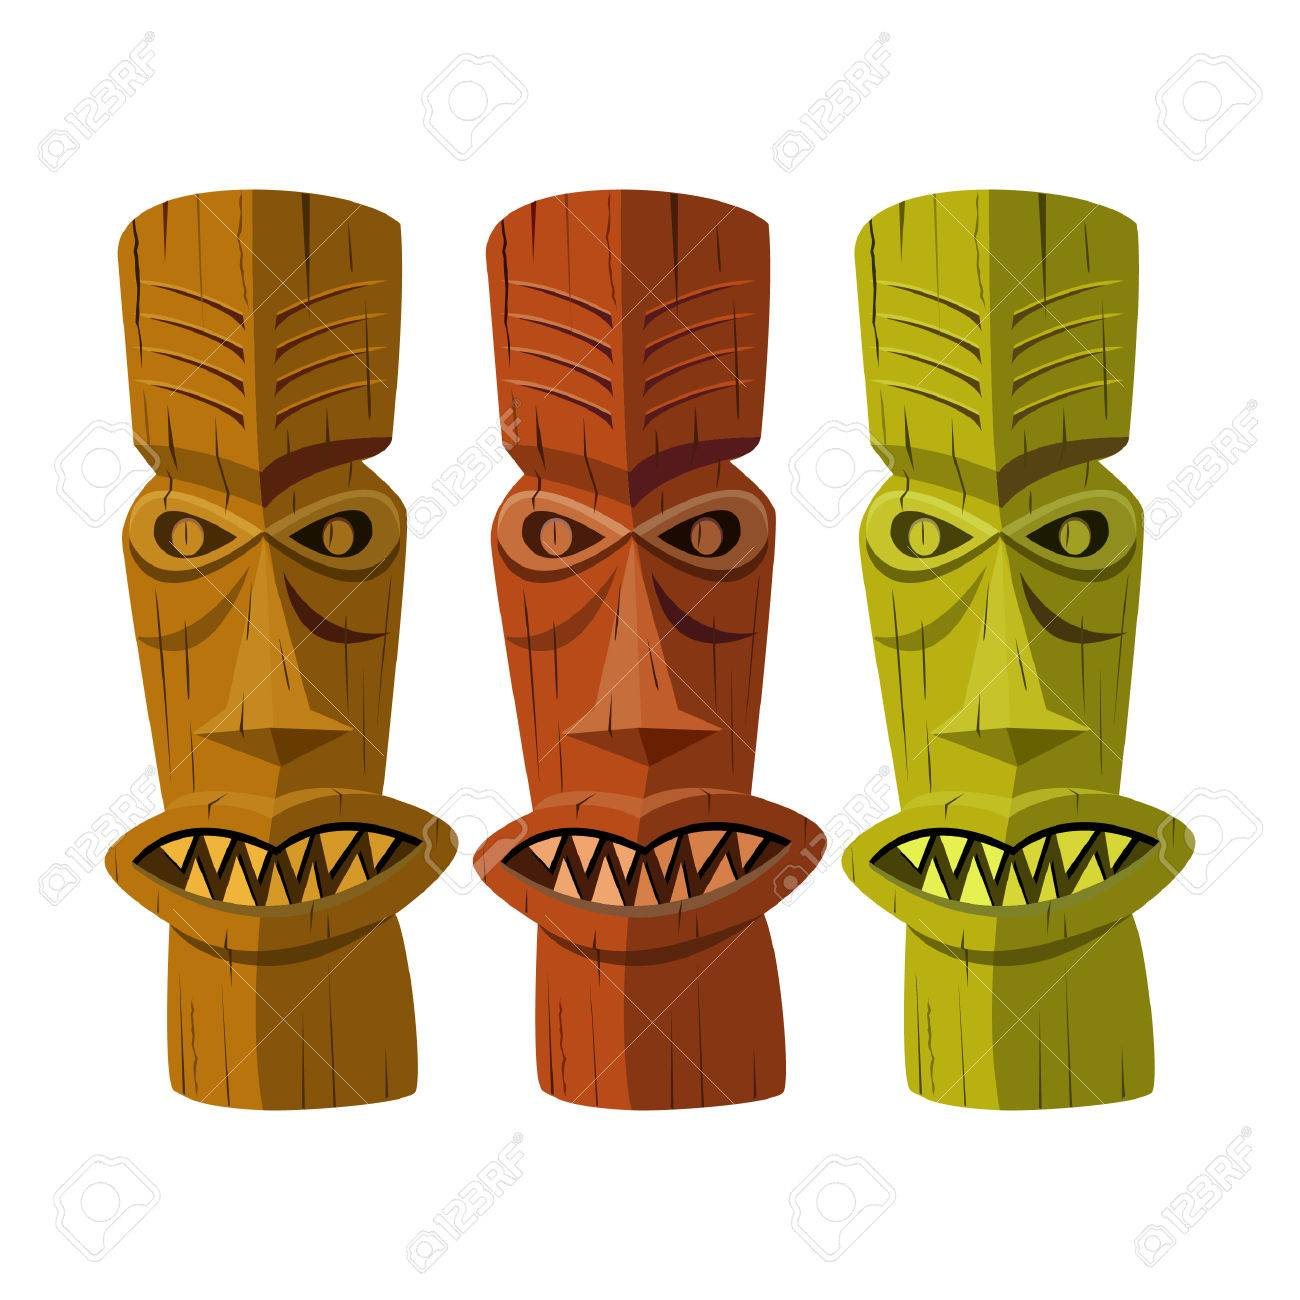 189 Tiki God Cliparts, Stock Vector And Royalty Free Tiki God ...